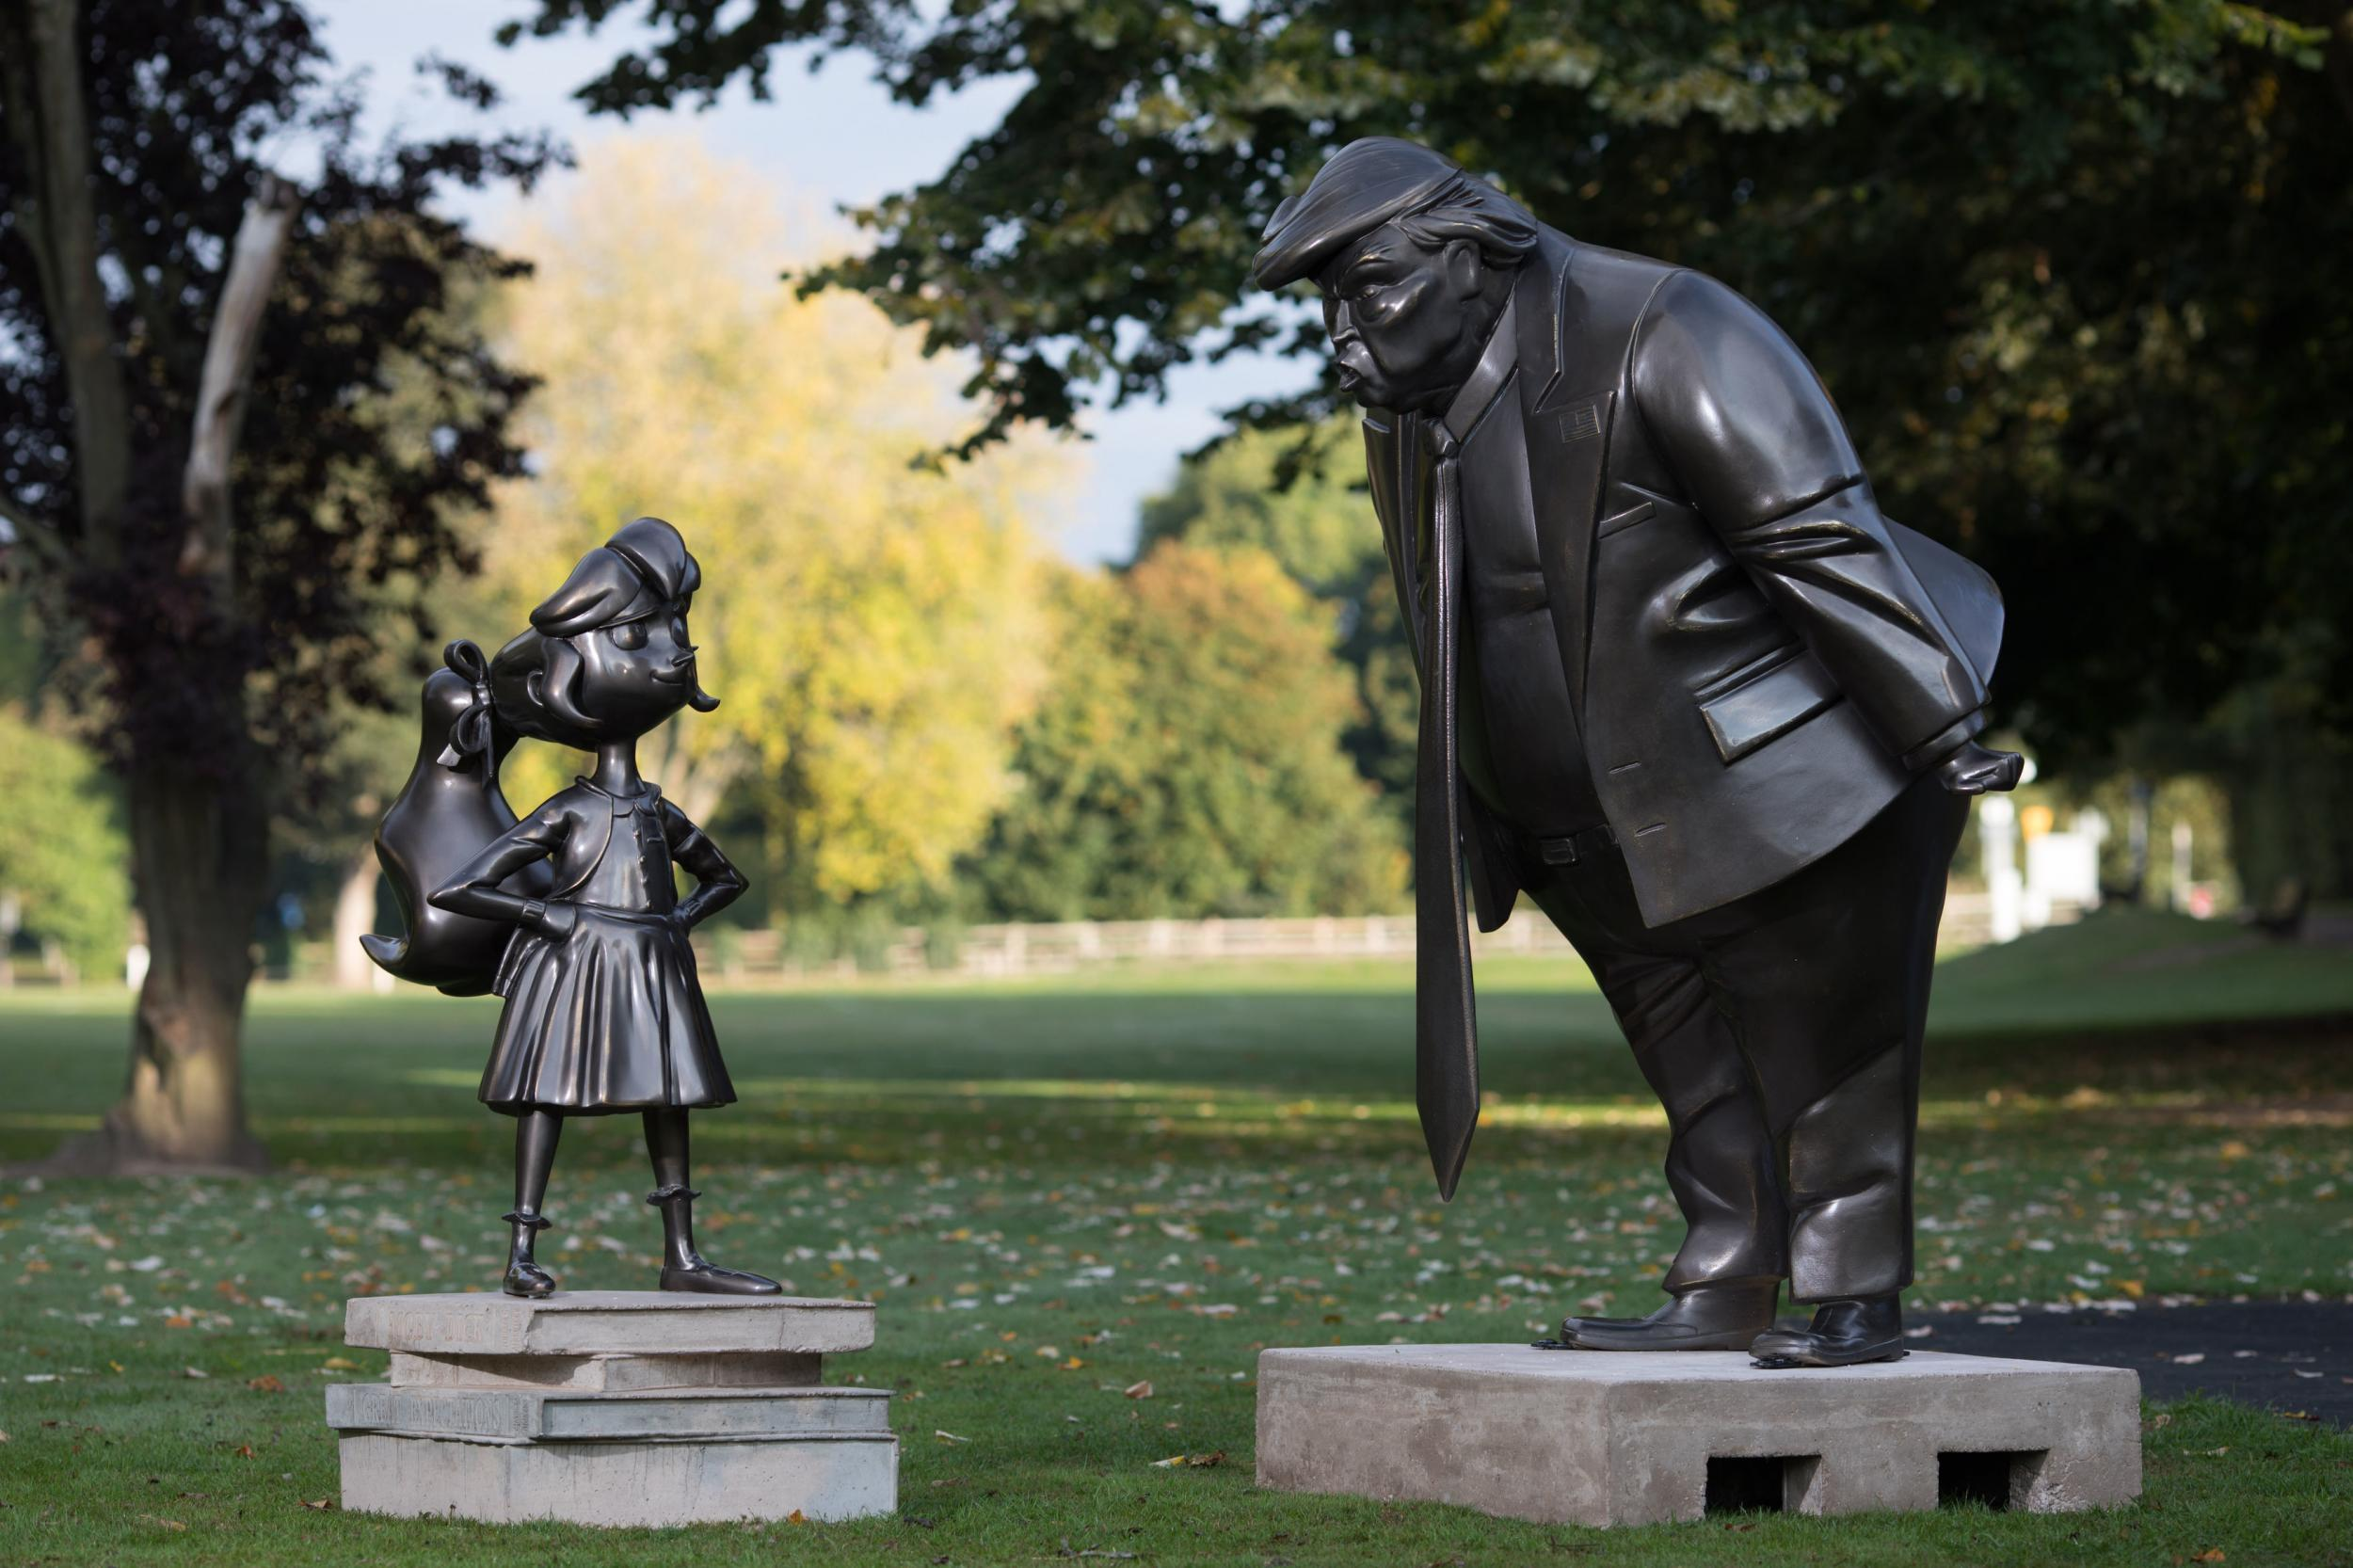 Matilda statue standing defiantly in front of Trump